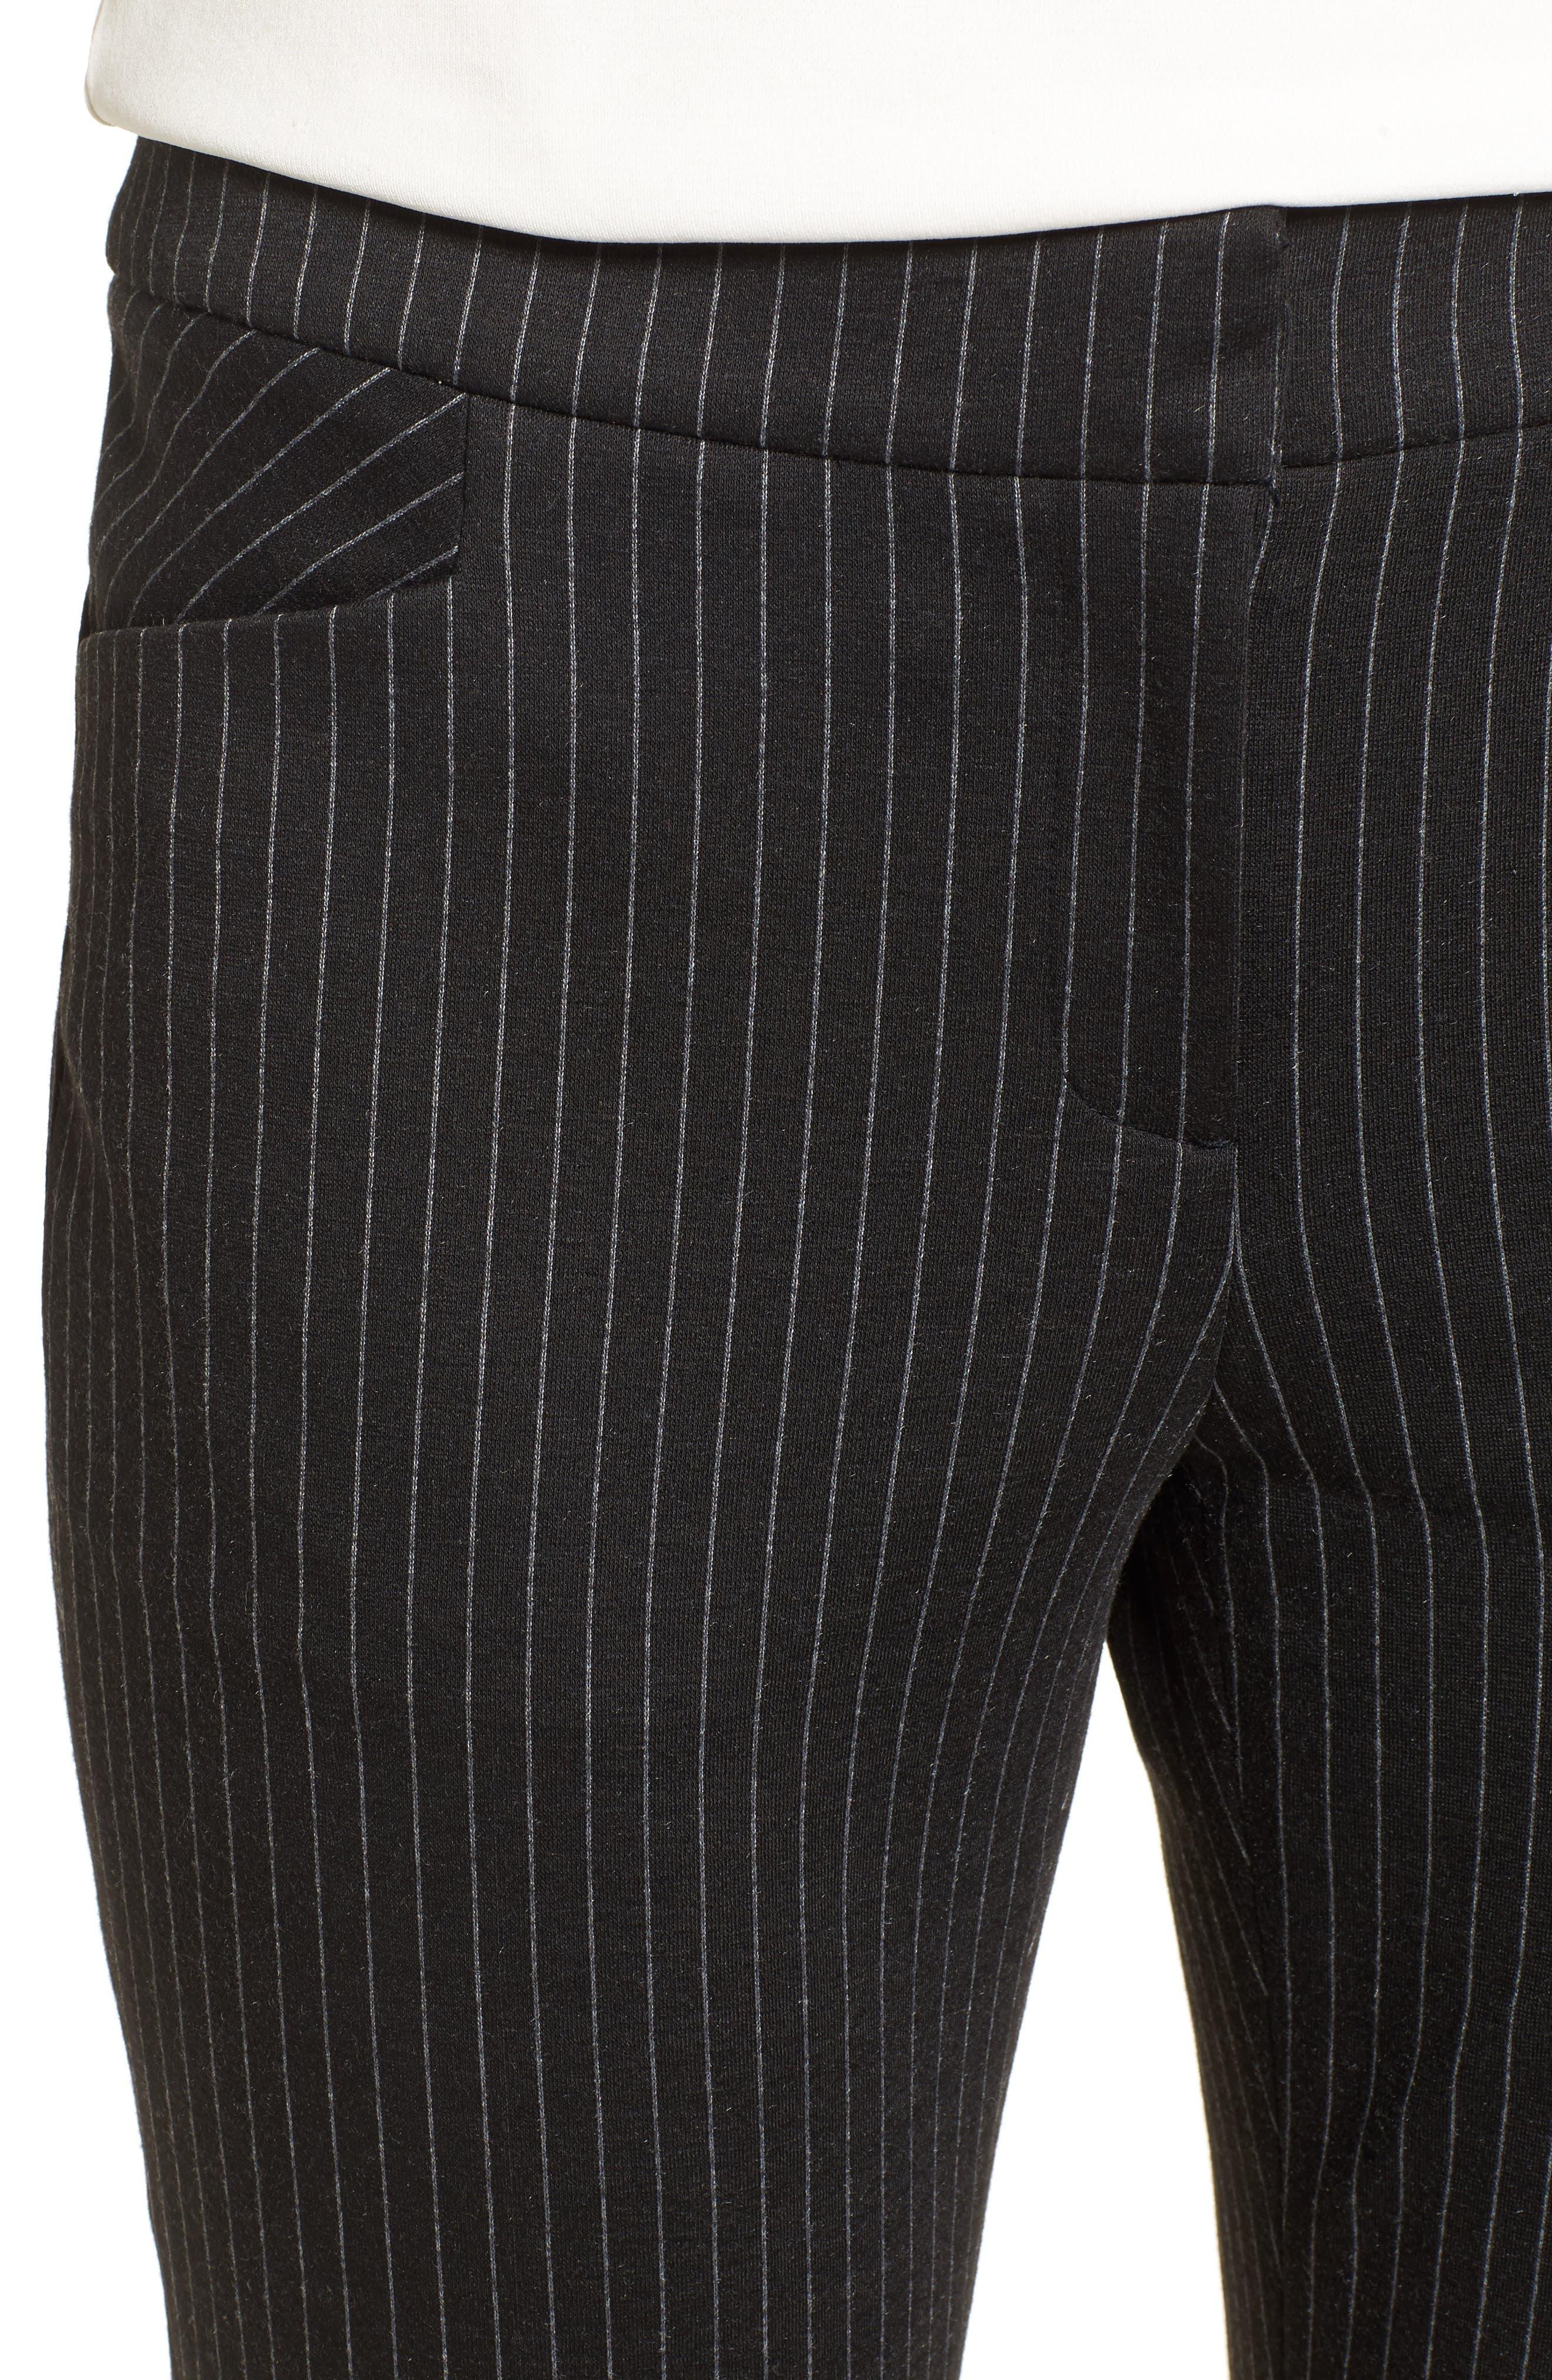 Pinstripe Ankle Pants,                             Alternate thumbnail 4, color,                             001